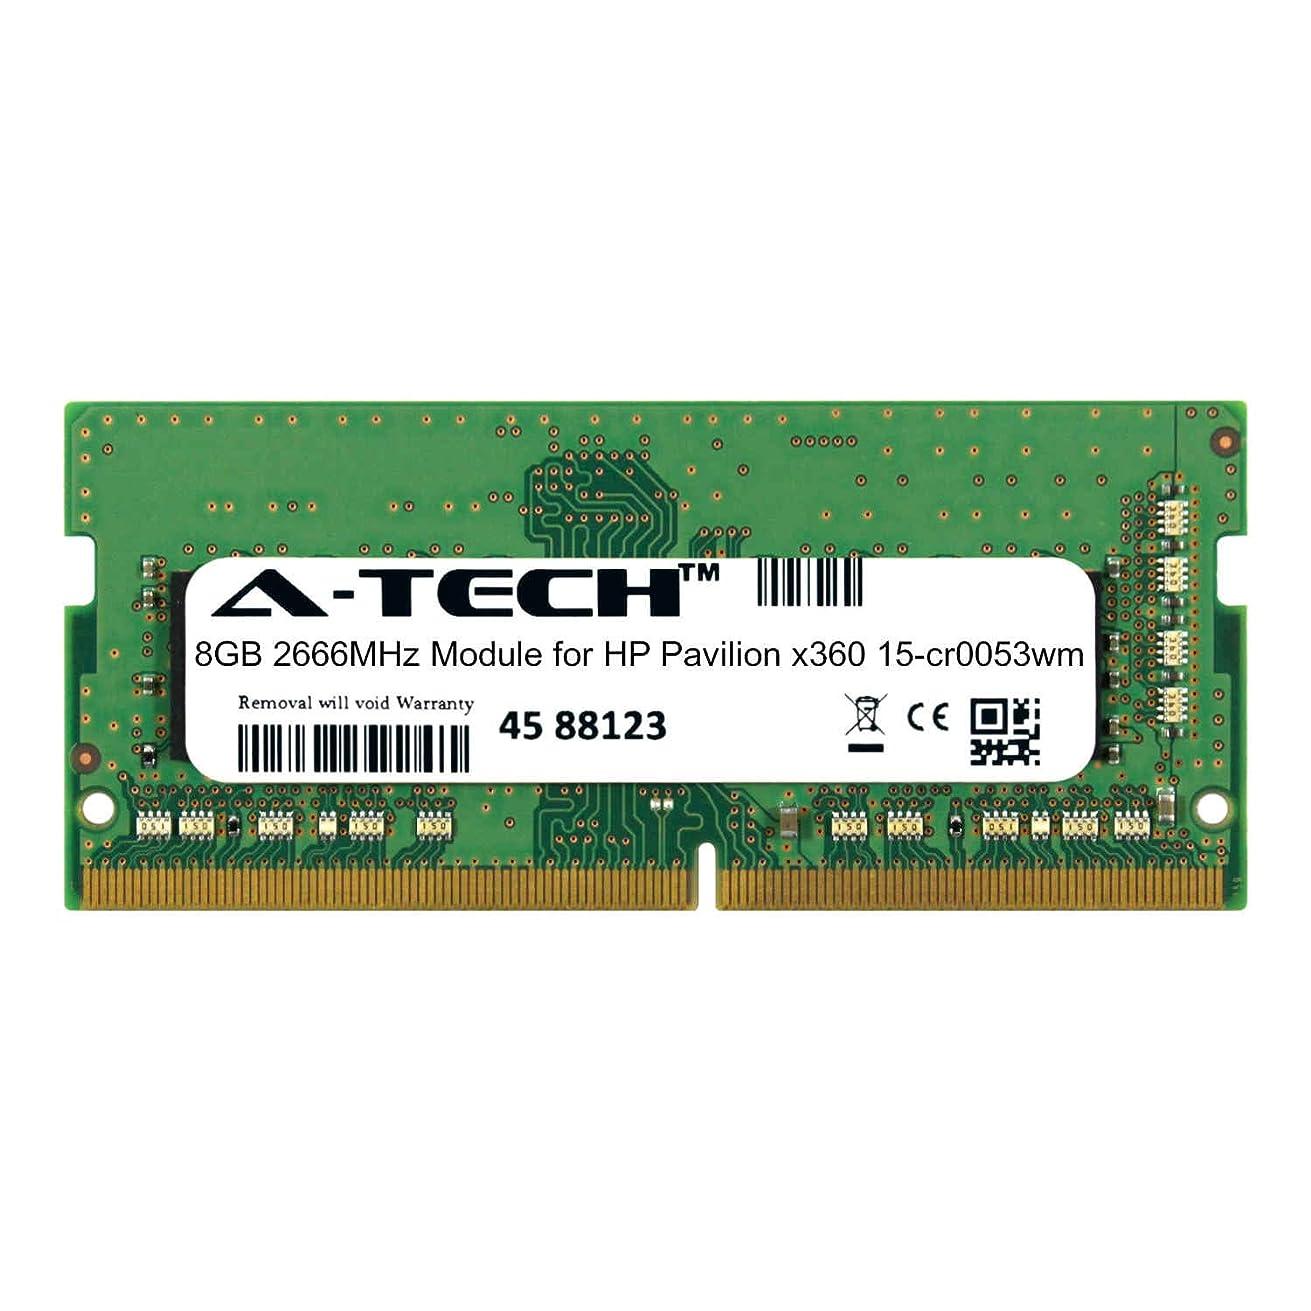 A-Tech 8GB Module for HP Pavilion x360 15-cr0053wm Laptop & Notebook Compatible DDR4 2666Mhz Memory Ram (ATMS312865A25978X1)